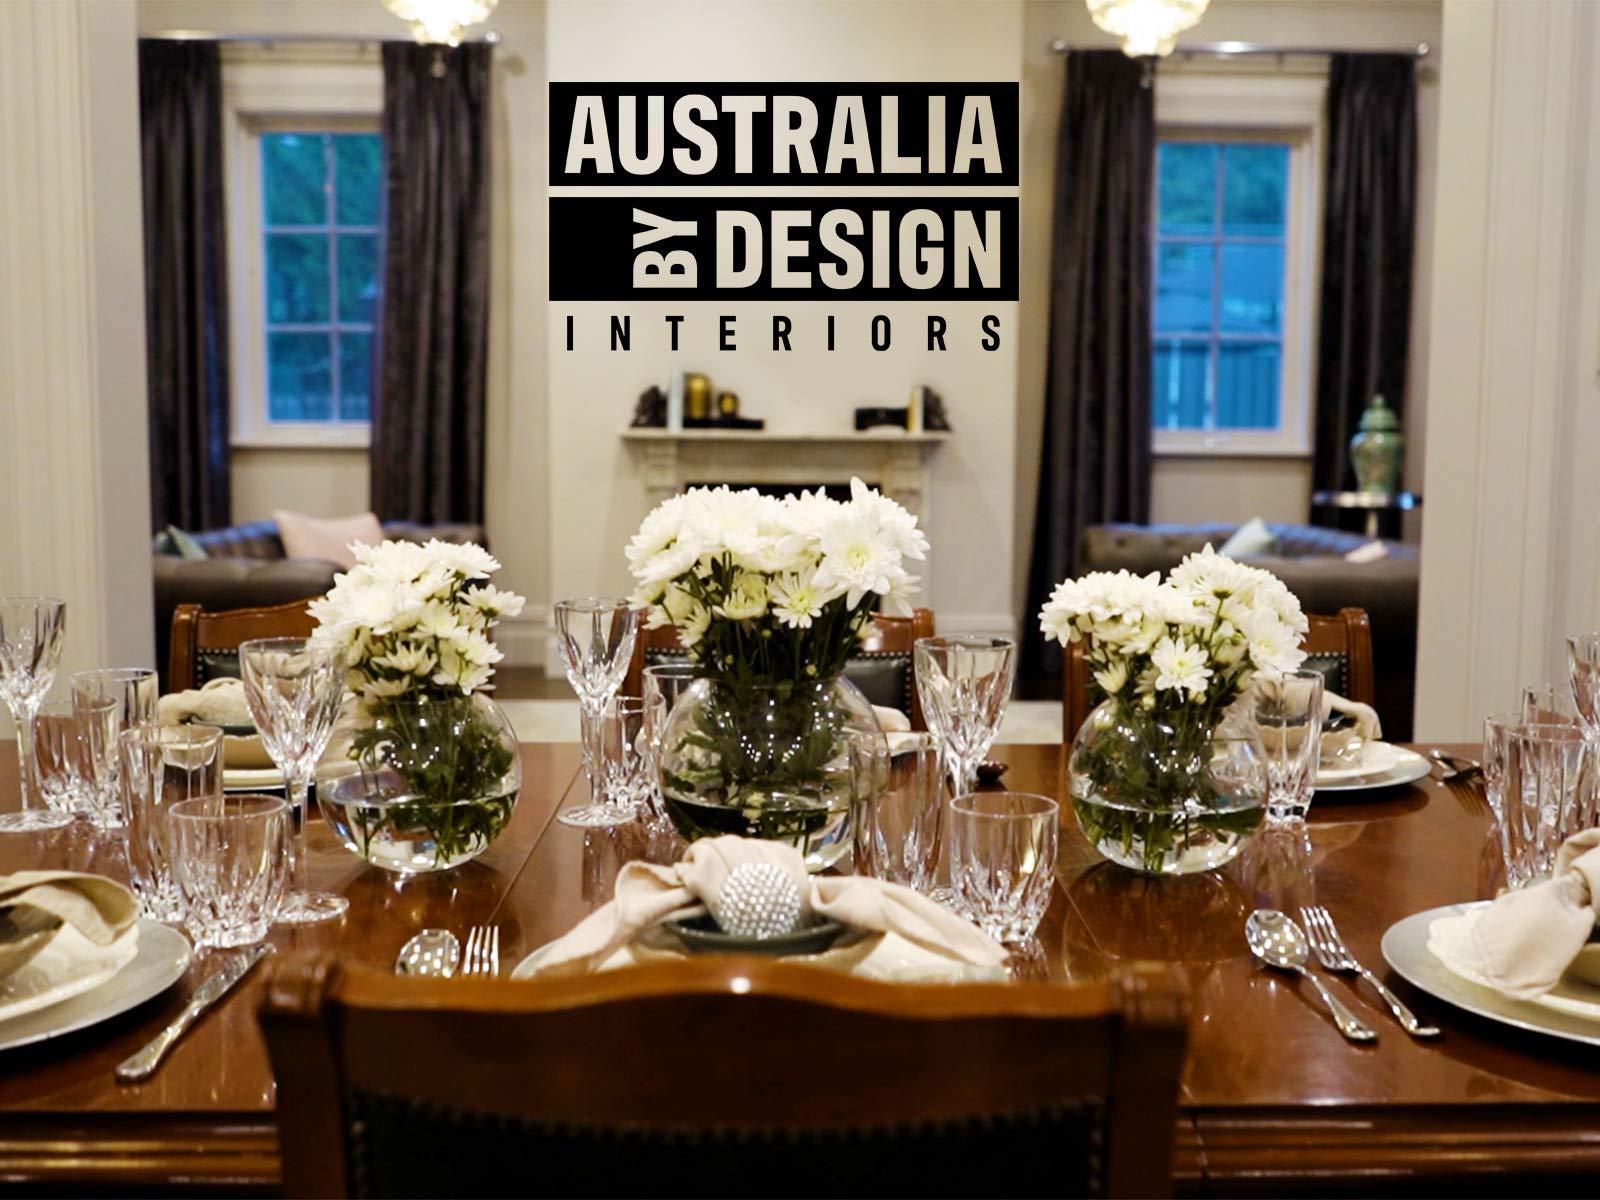 Australia By Design: Interiors - Season 2